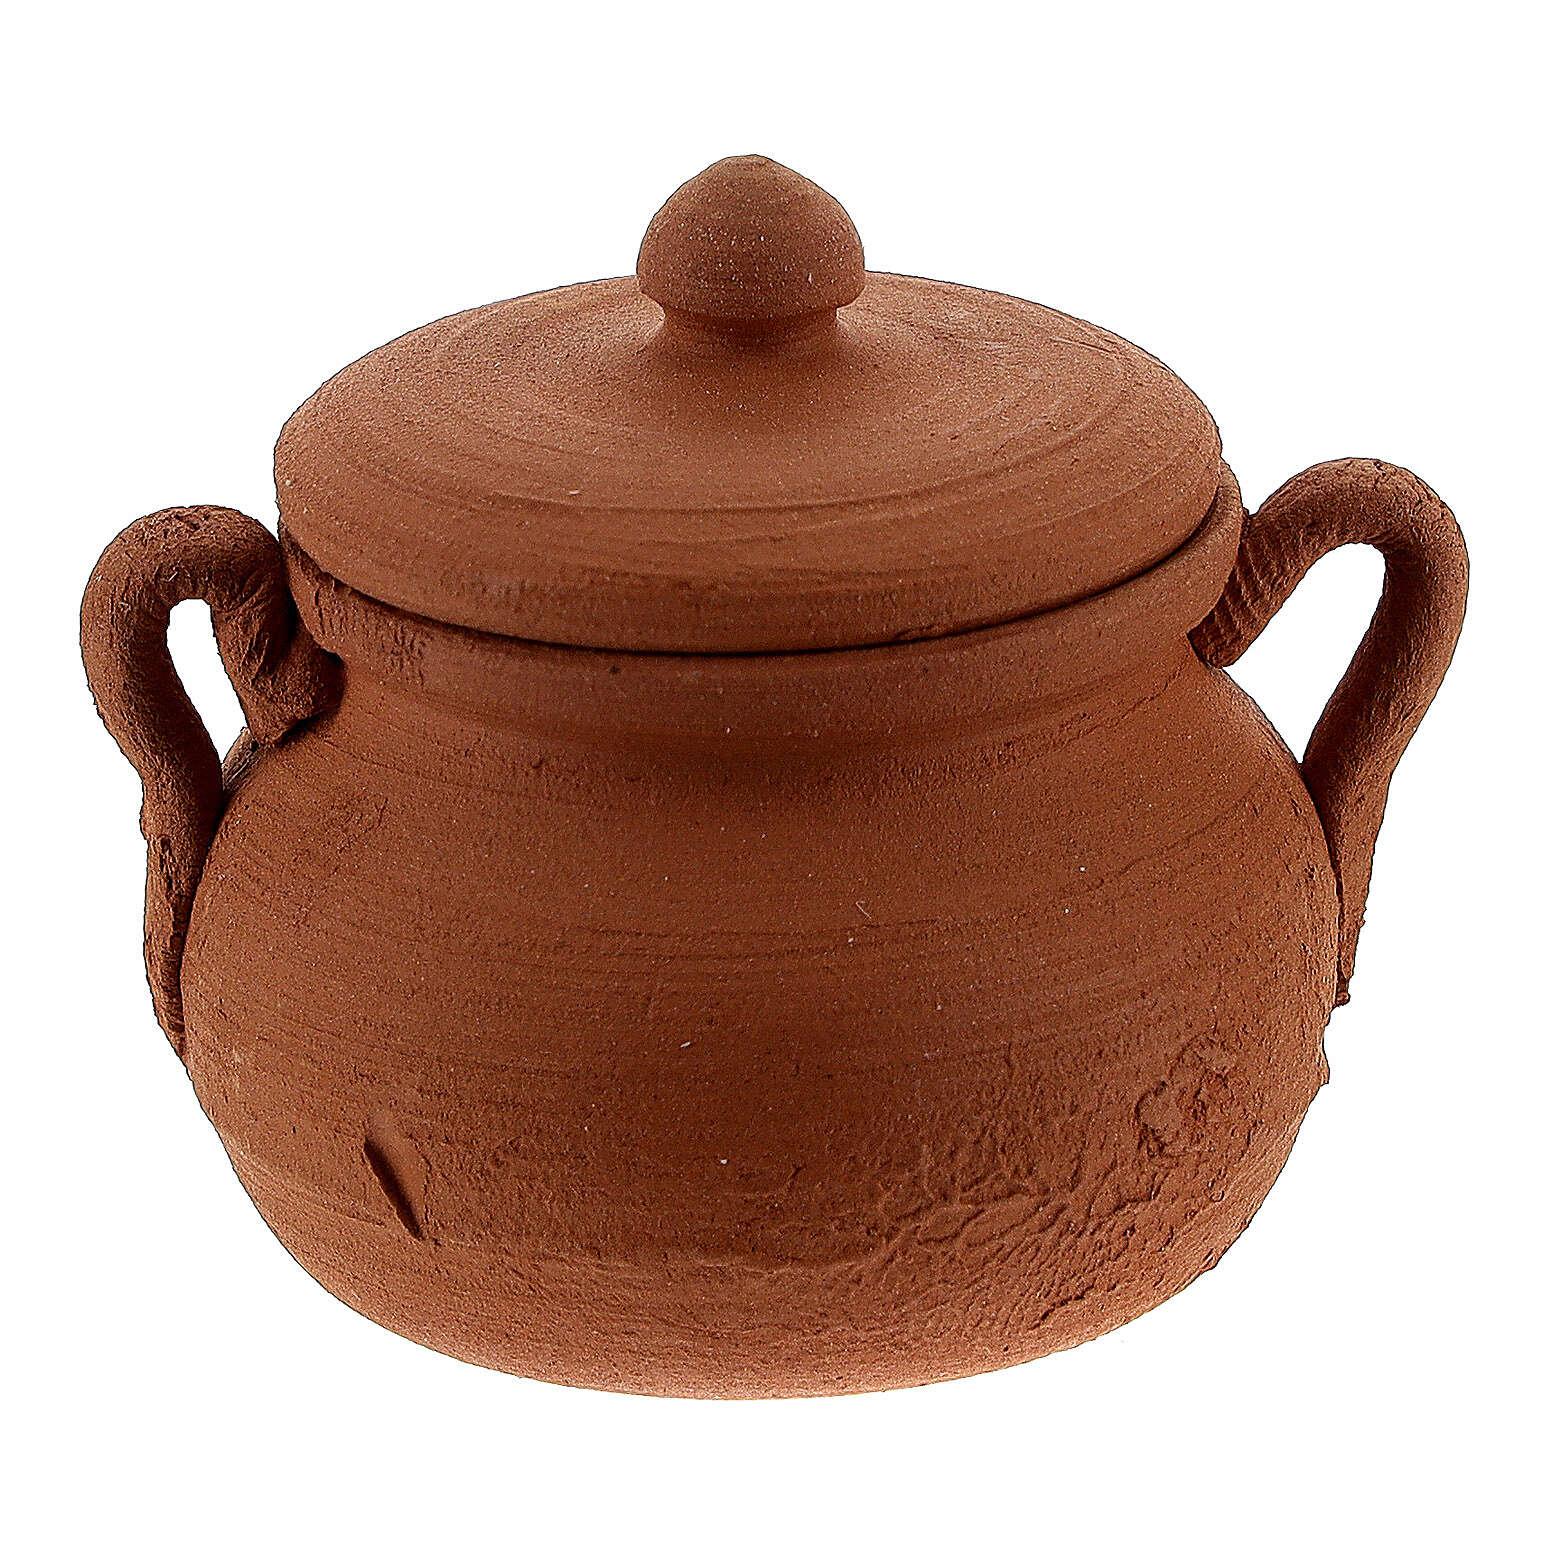 Terracotta pot with lid Nativity scene 12 cm 4